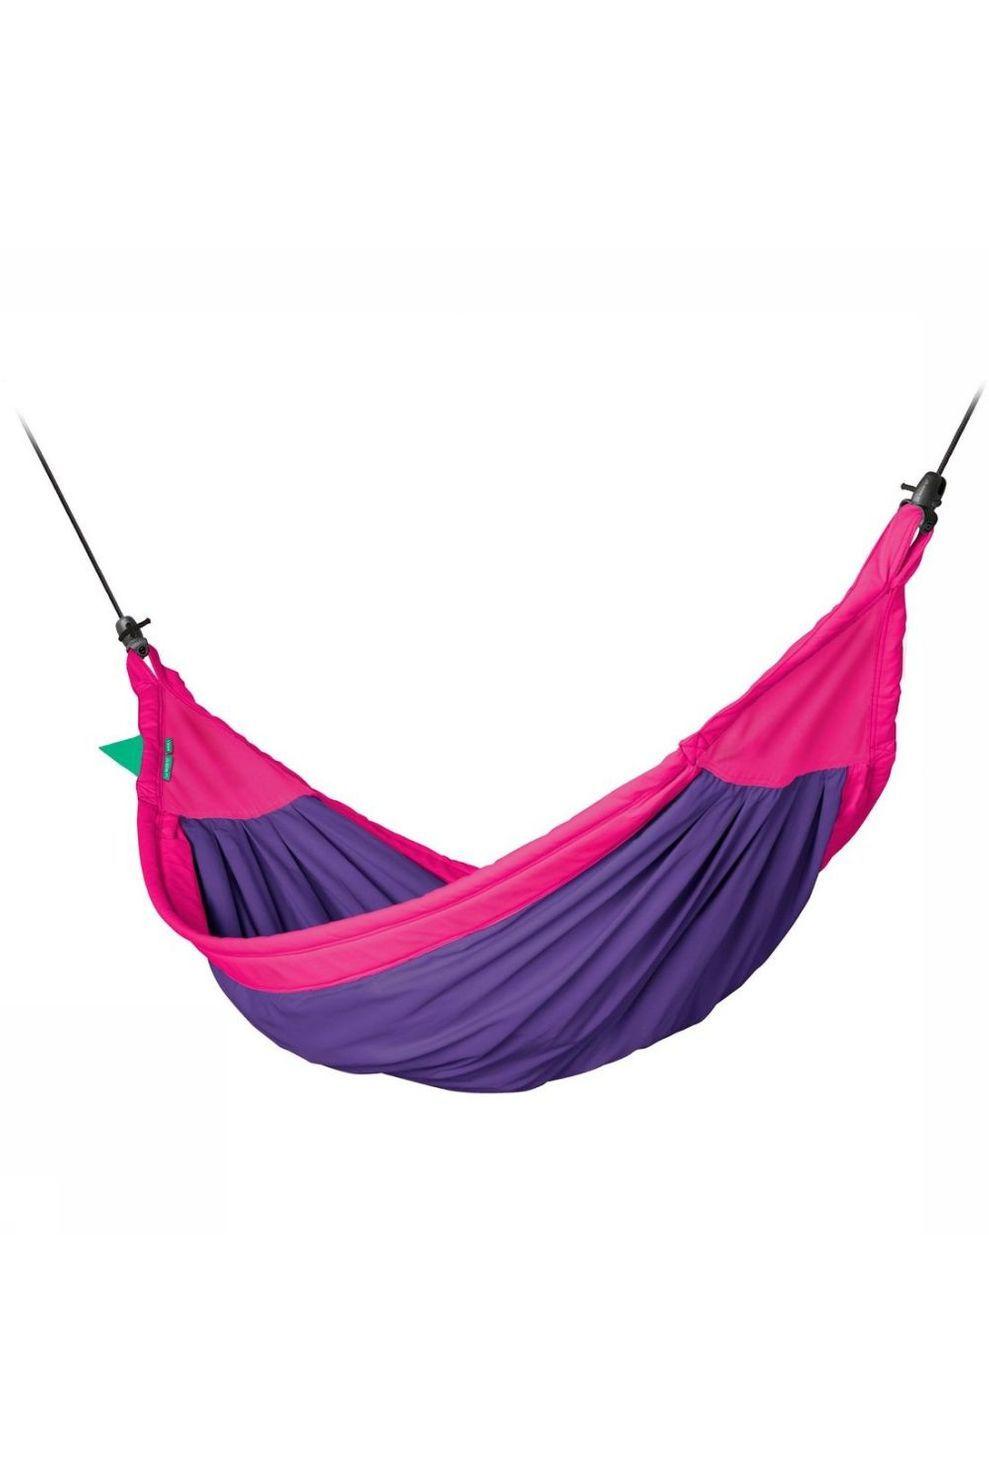 La Siesta Hangmat Moki - Paars/Roze